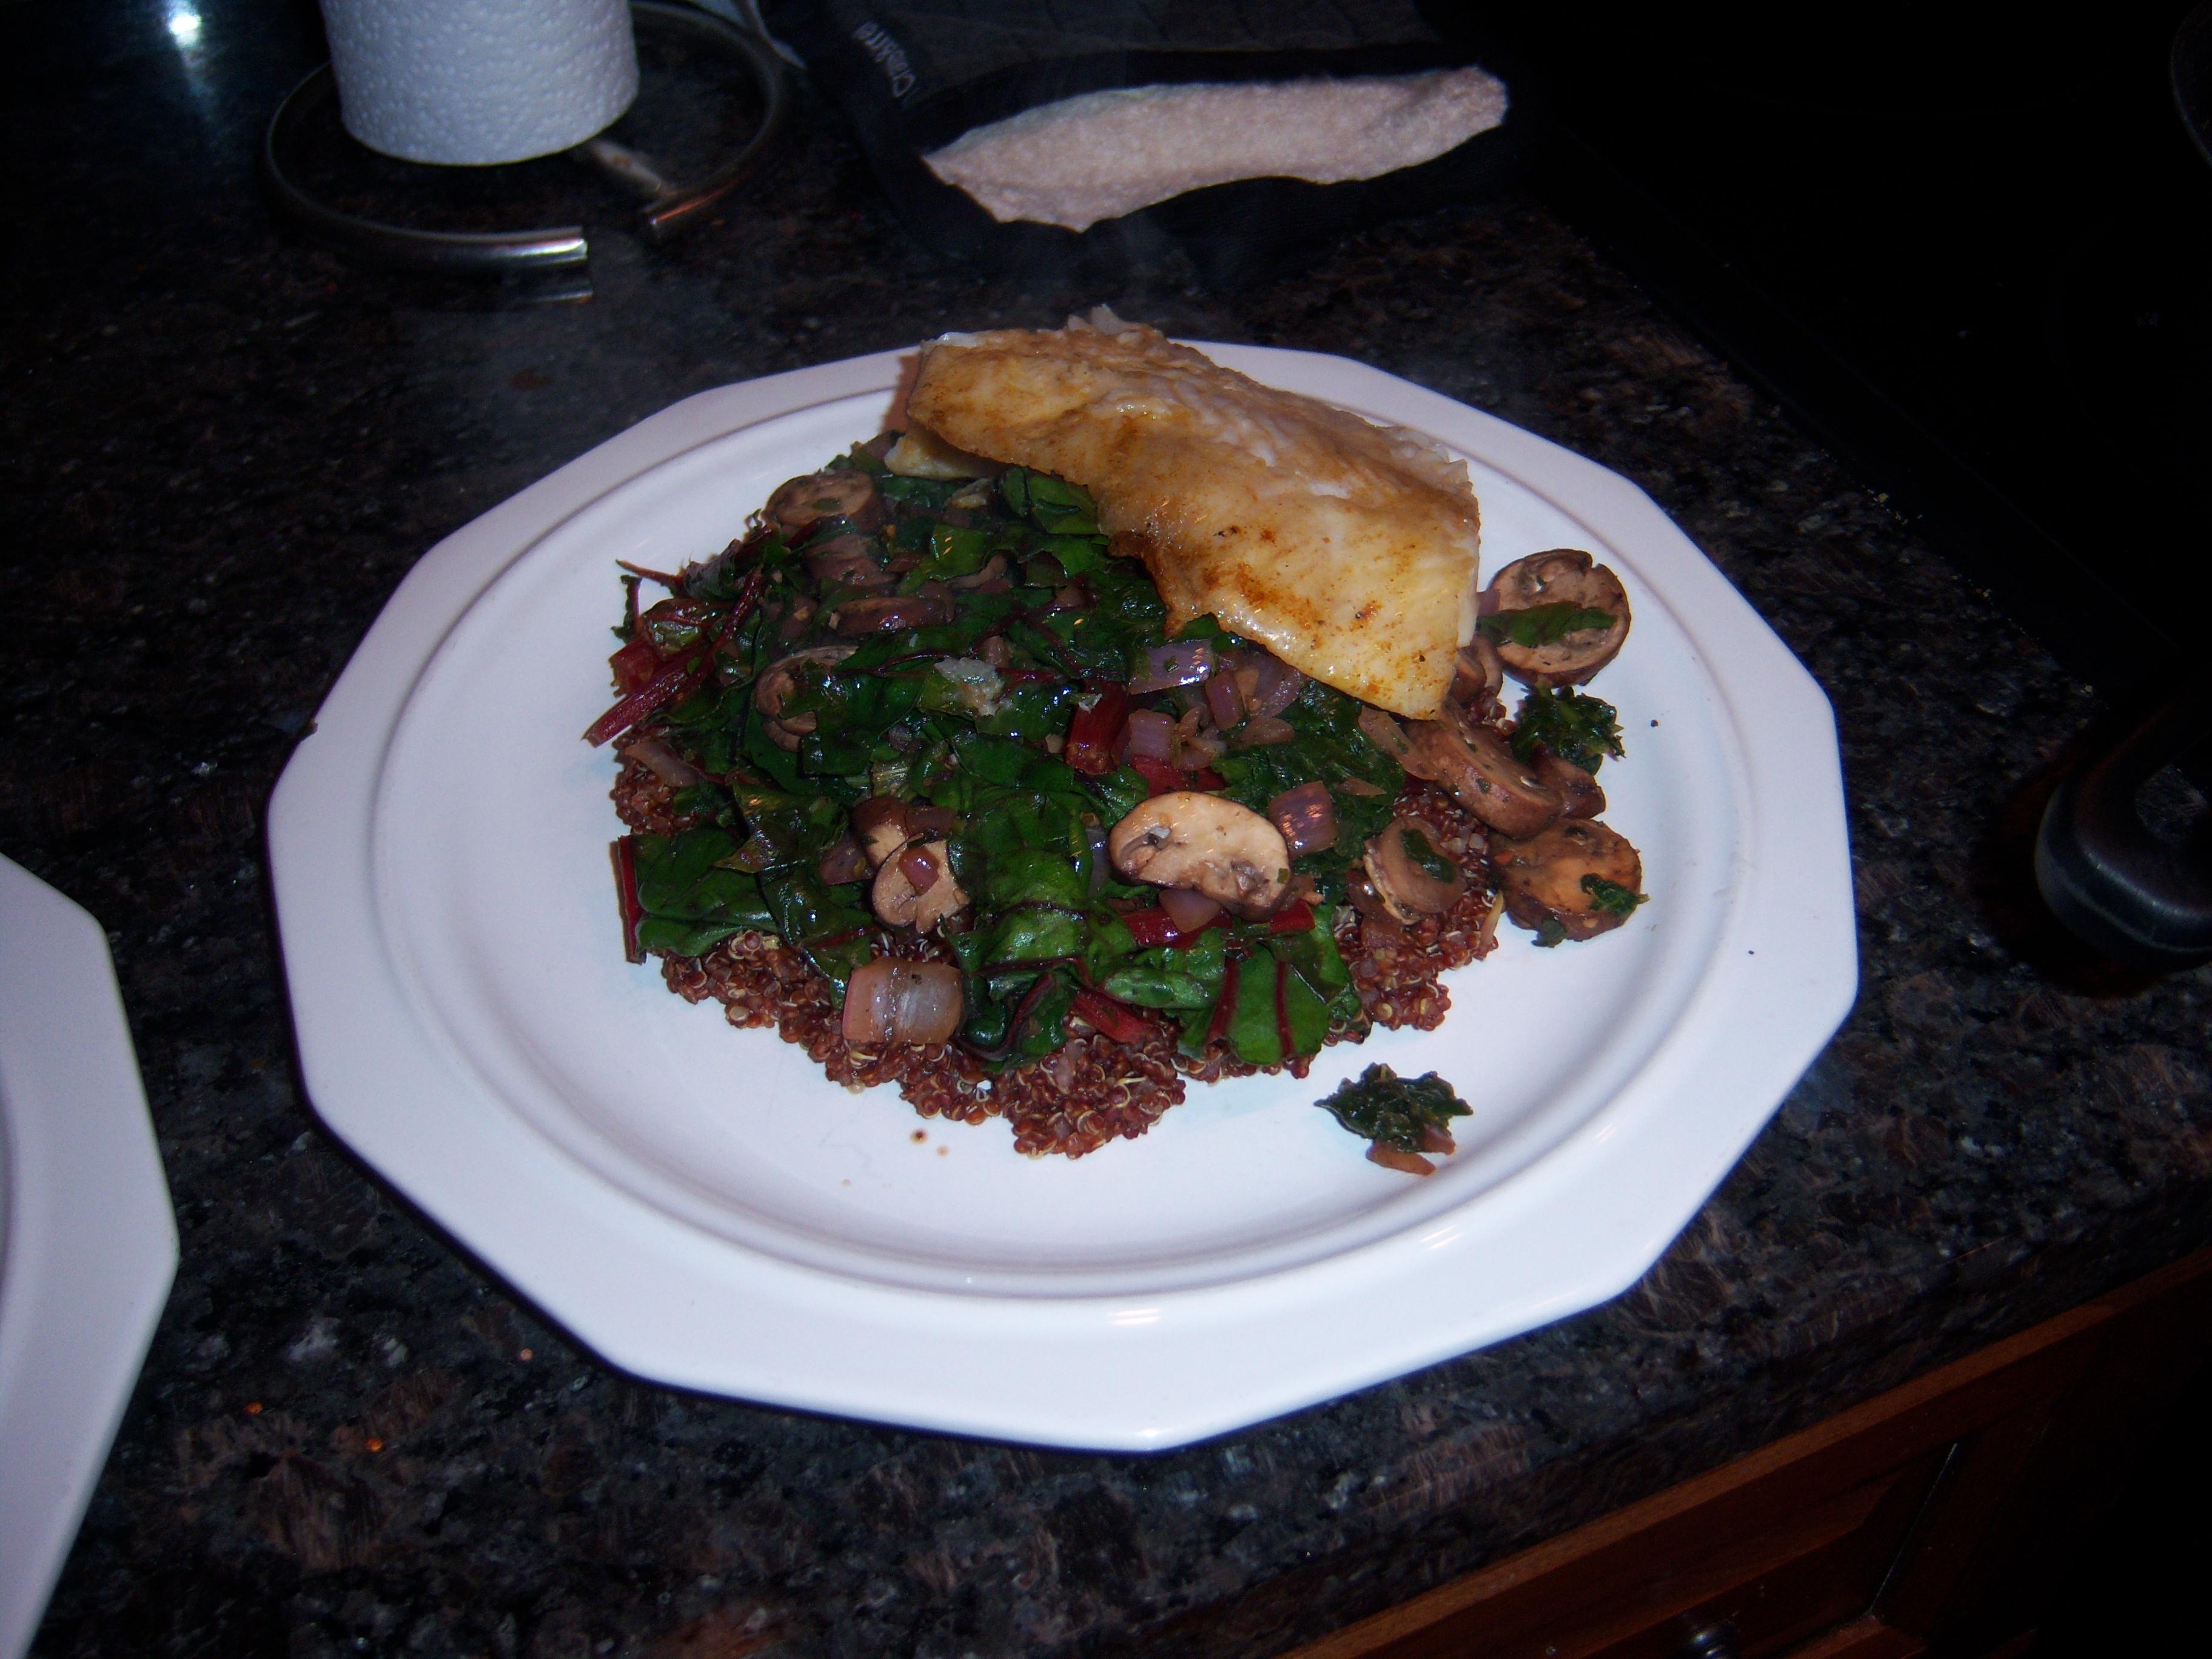 ... chard quinoa mushroom chard salad chard and mushroom quinoa chard